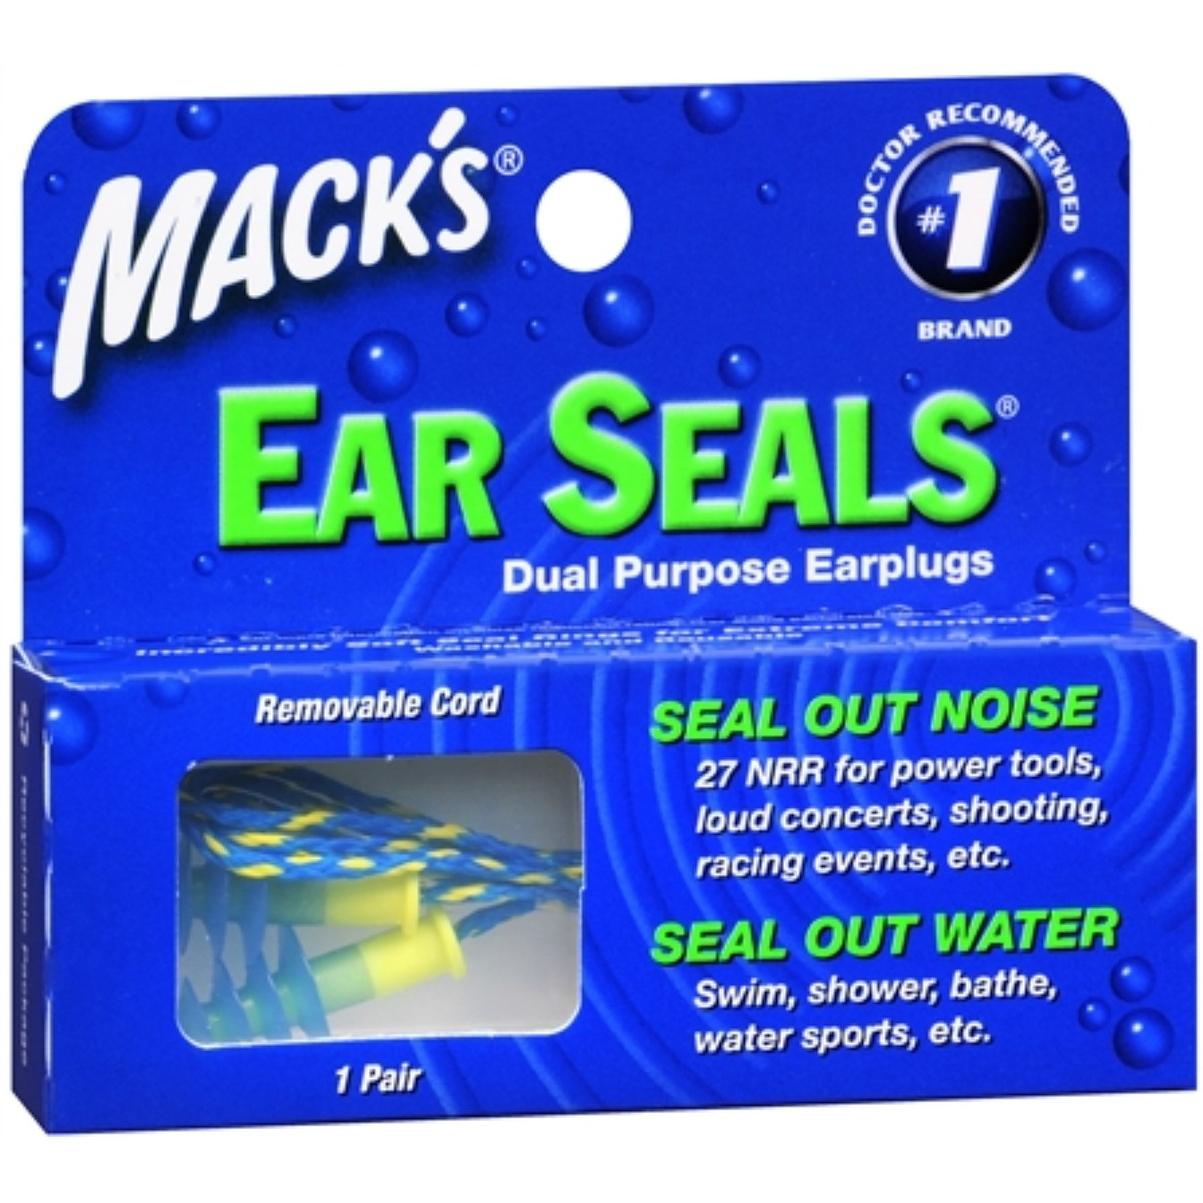 Mack's Ear Seals Dual Purpose Earplugs 1 Pair (4 options available)